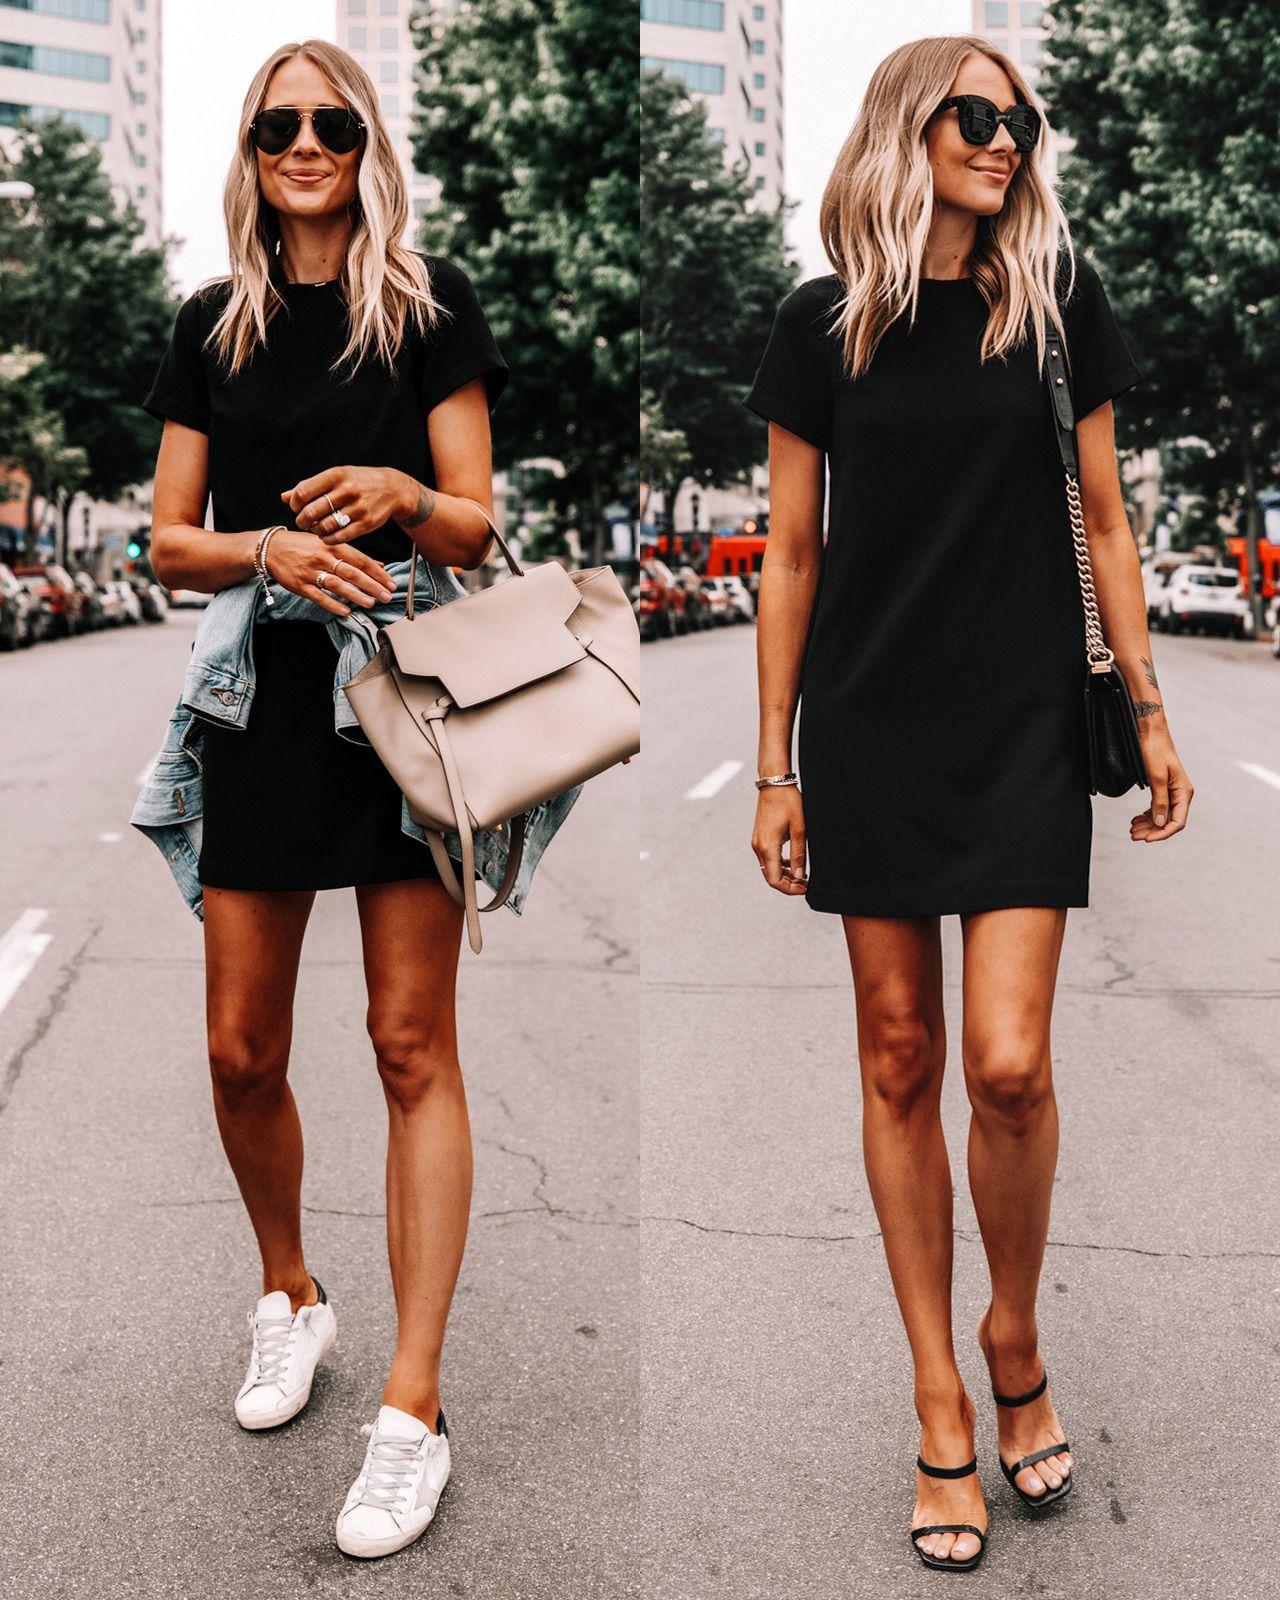 Little Black Dress Summer Little Black Dress Little Black Dress Casual Little Black Dress Dressy Fashion Jackson Black Dresses Casual Simple Casual Outfits [ 1600 x 1280 Pixel ]